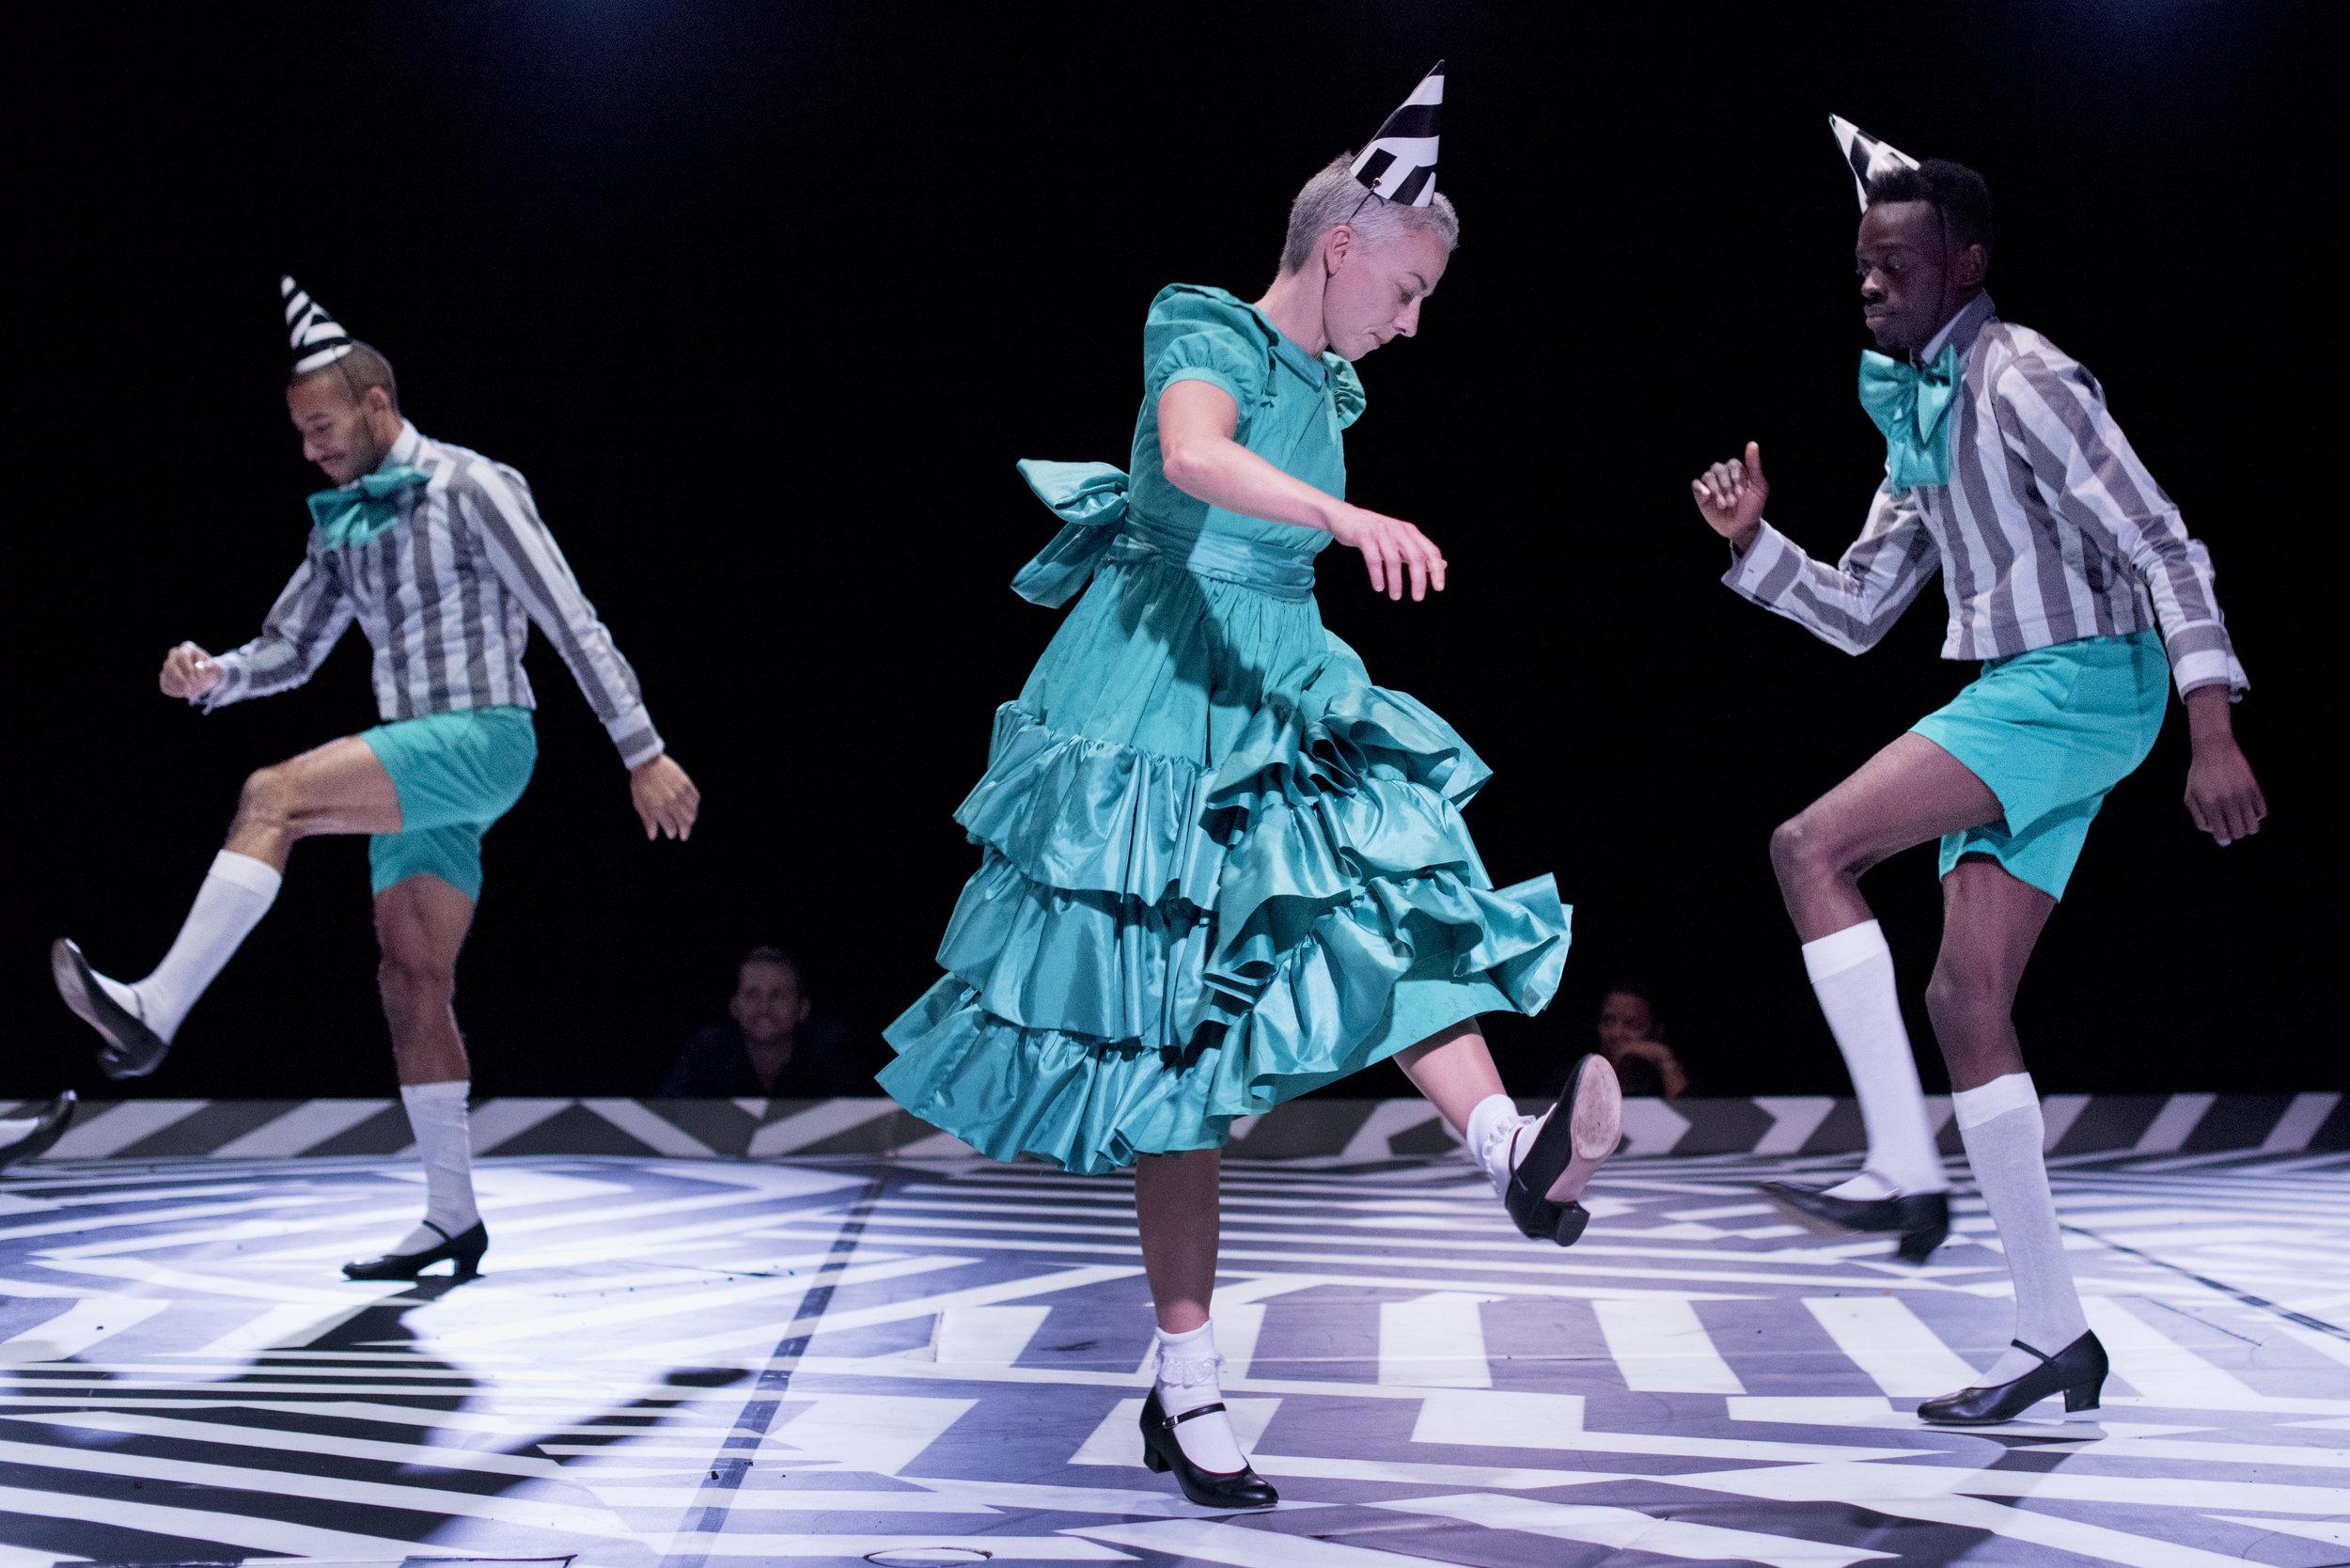 DeadClub_Requardt&Rosenberg_Dancers_Owen Ridley-DeMonick-Valentina Formenti, Jordan Ajadi-PhotoCamillaGreenwell.jpg